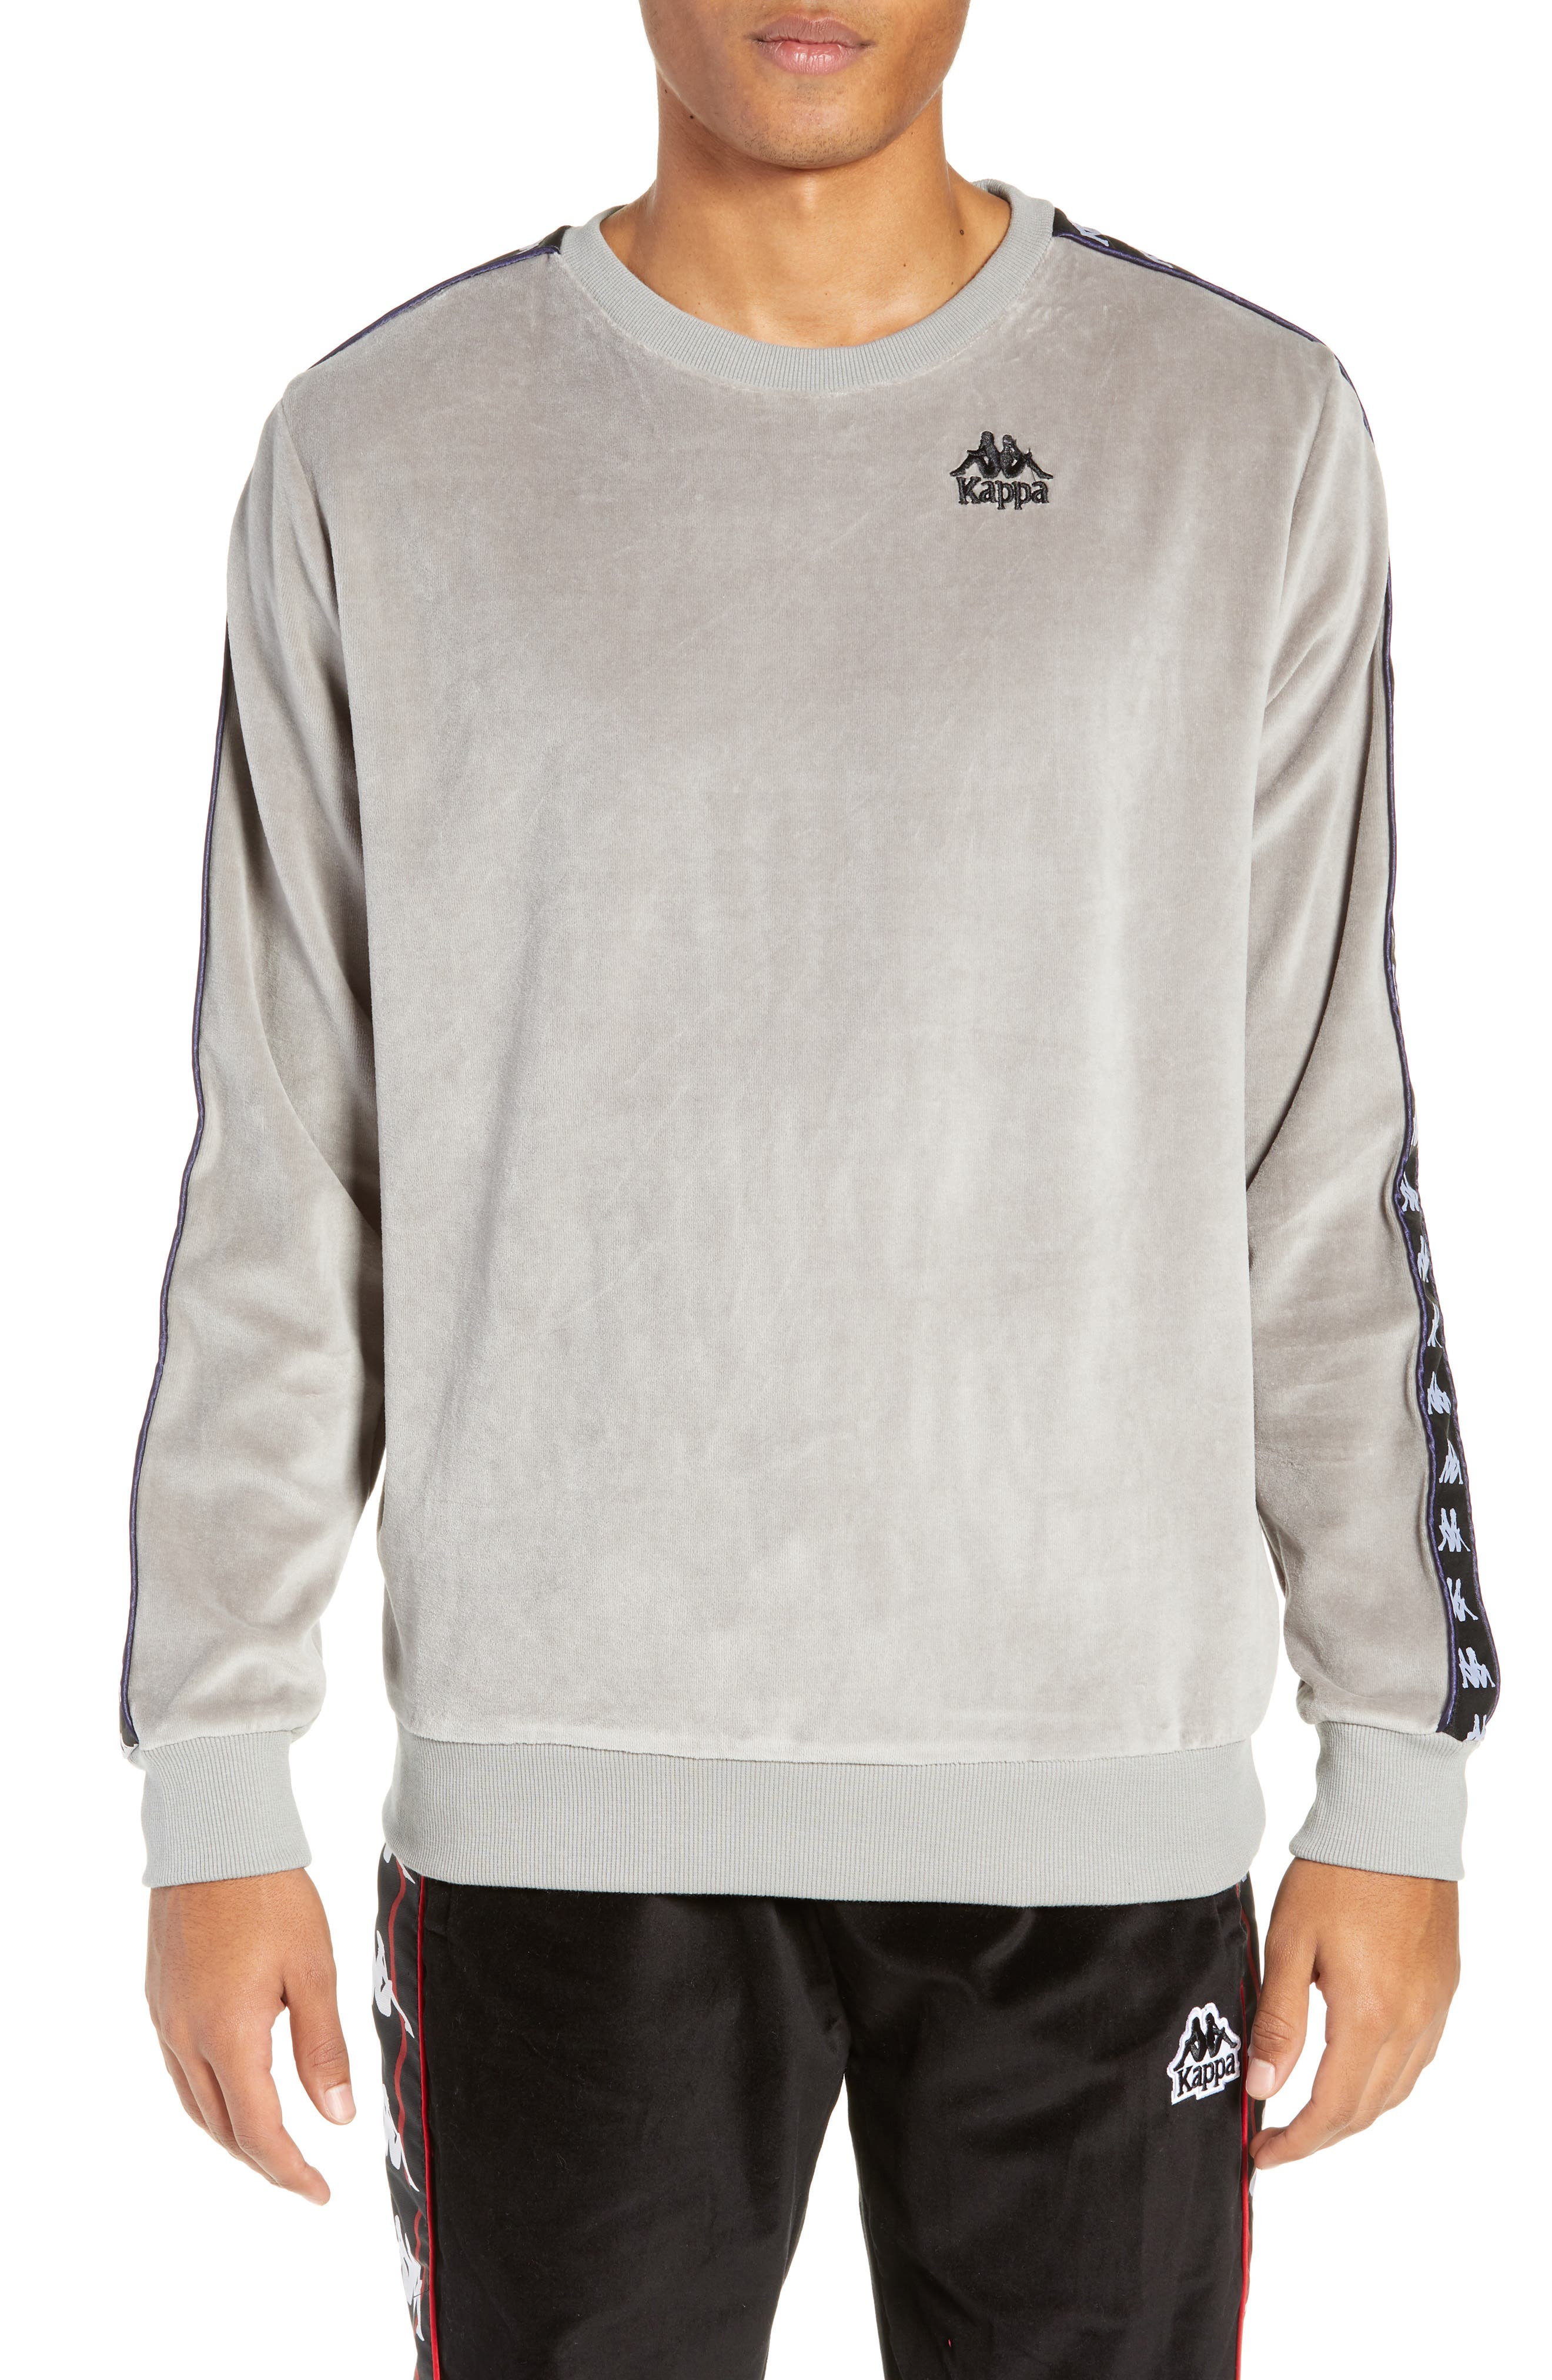 Authentic Aynset Velour Crewneck Sweatshirt,                             Main thumbnail 1, color,                             GREY MIST/ BLACK/ WHITE